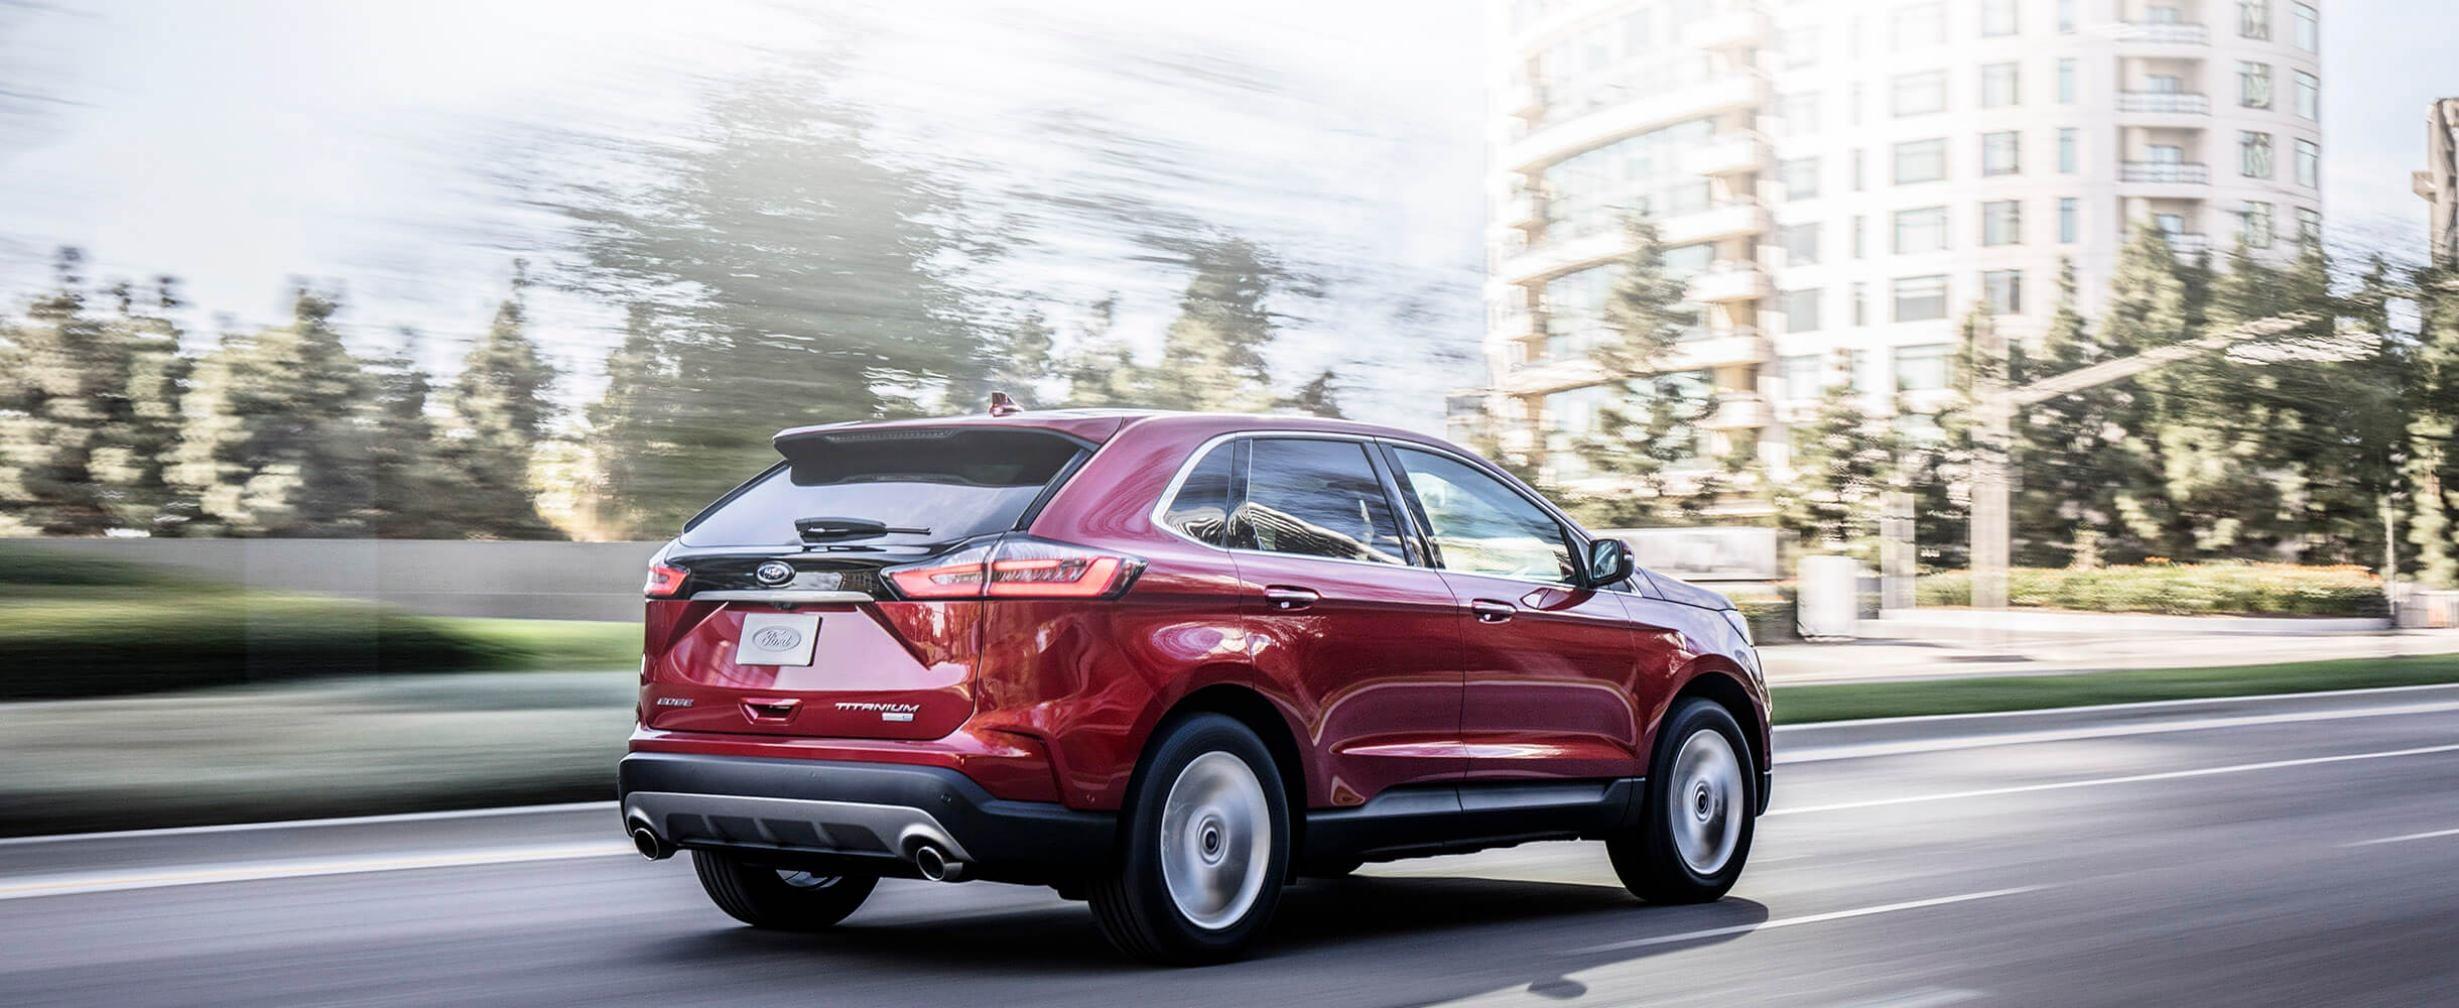 Save On Standard SUV Rental | Avis Rent a Car